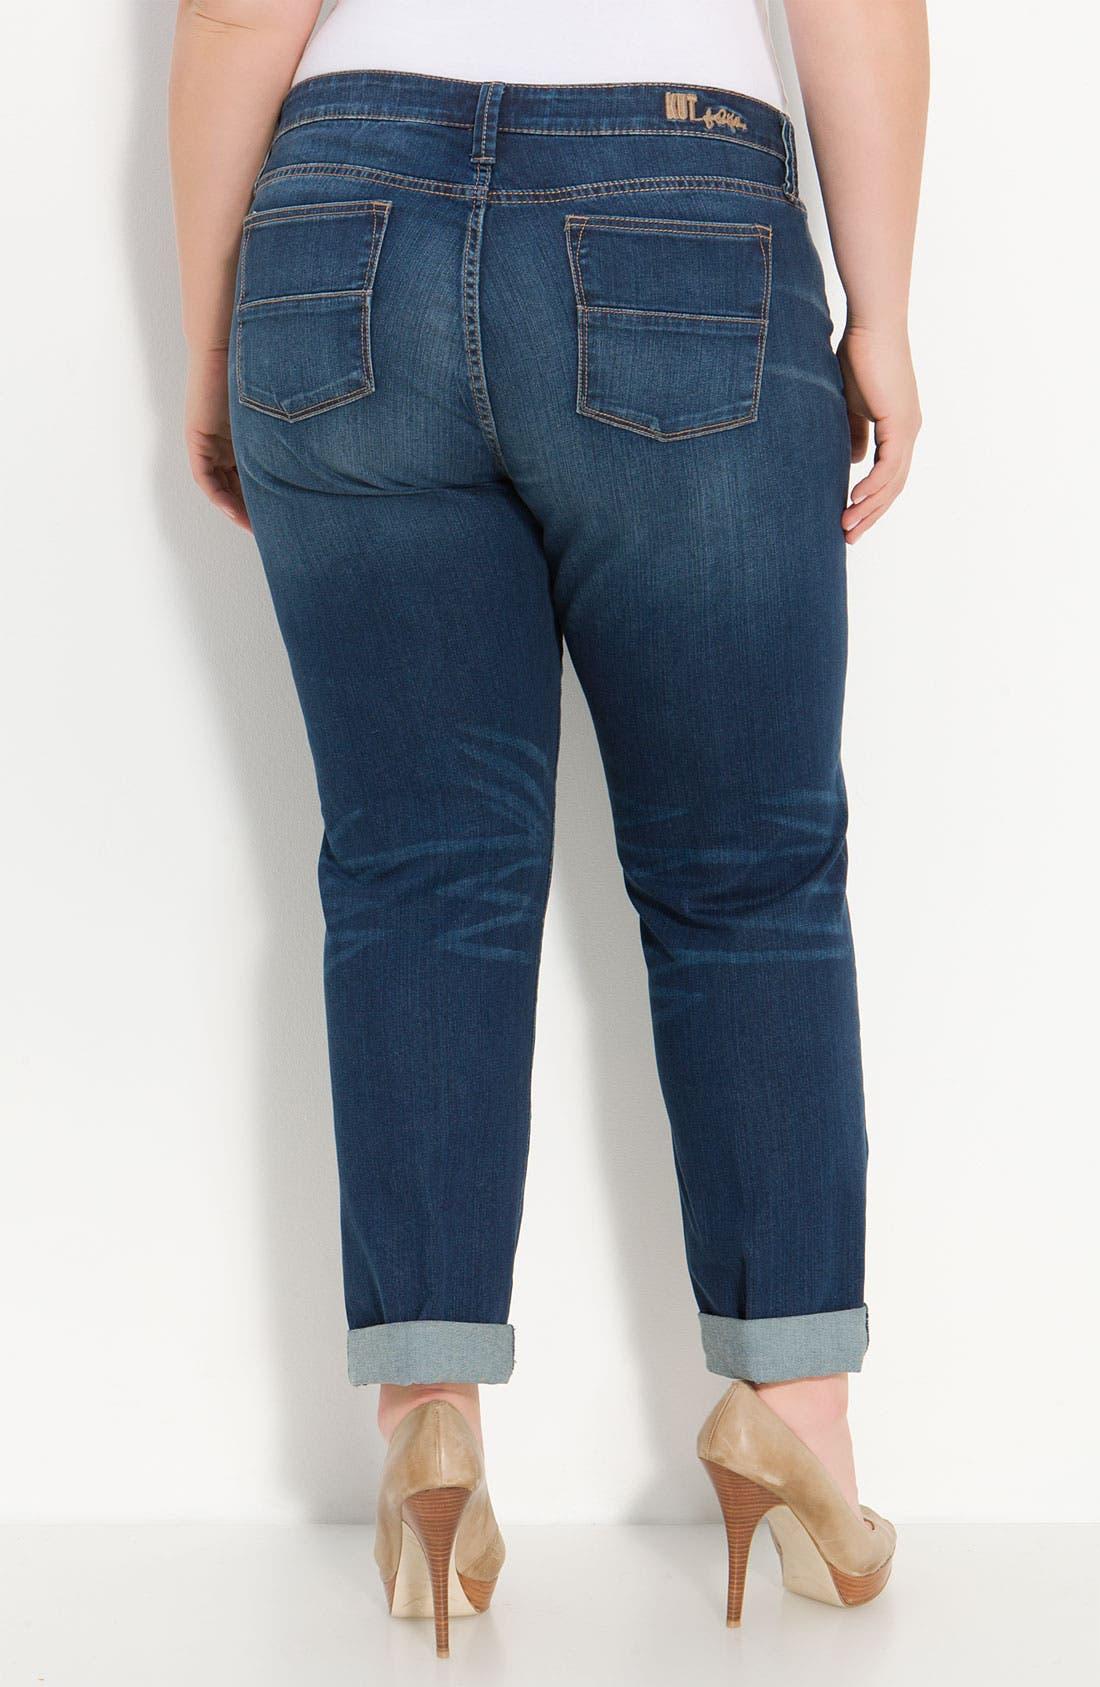 Alternate Image 1 Selected - KUT from the Kloth Crop Boyfriend Jeans (Plus)